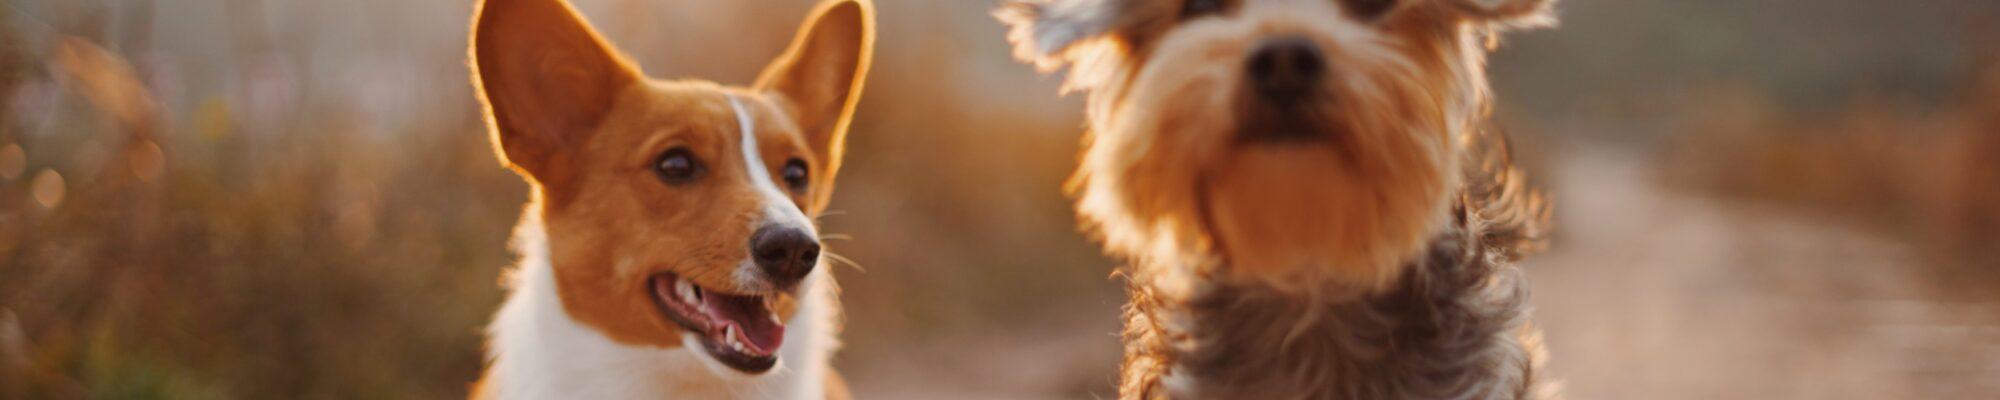 Hunddagis i Ulricehamn